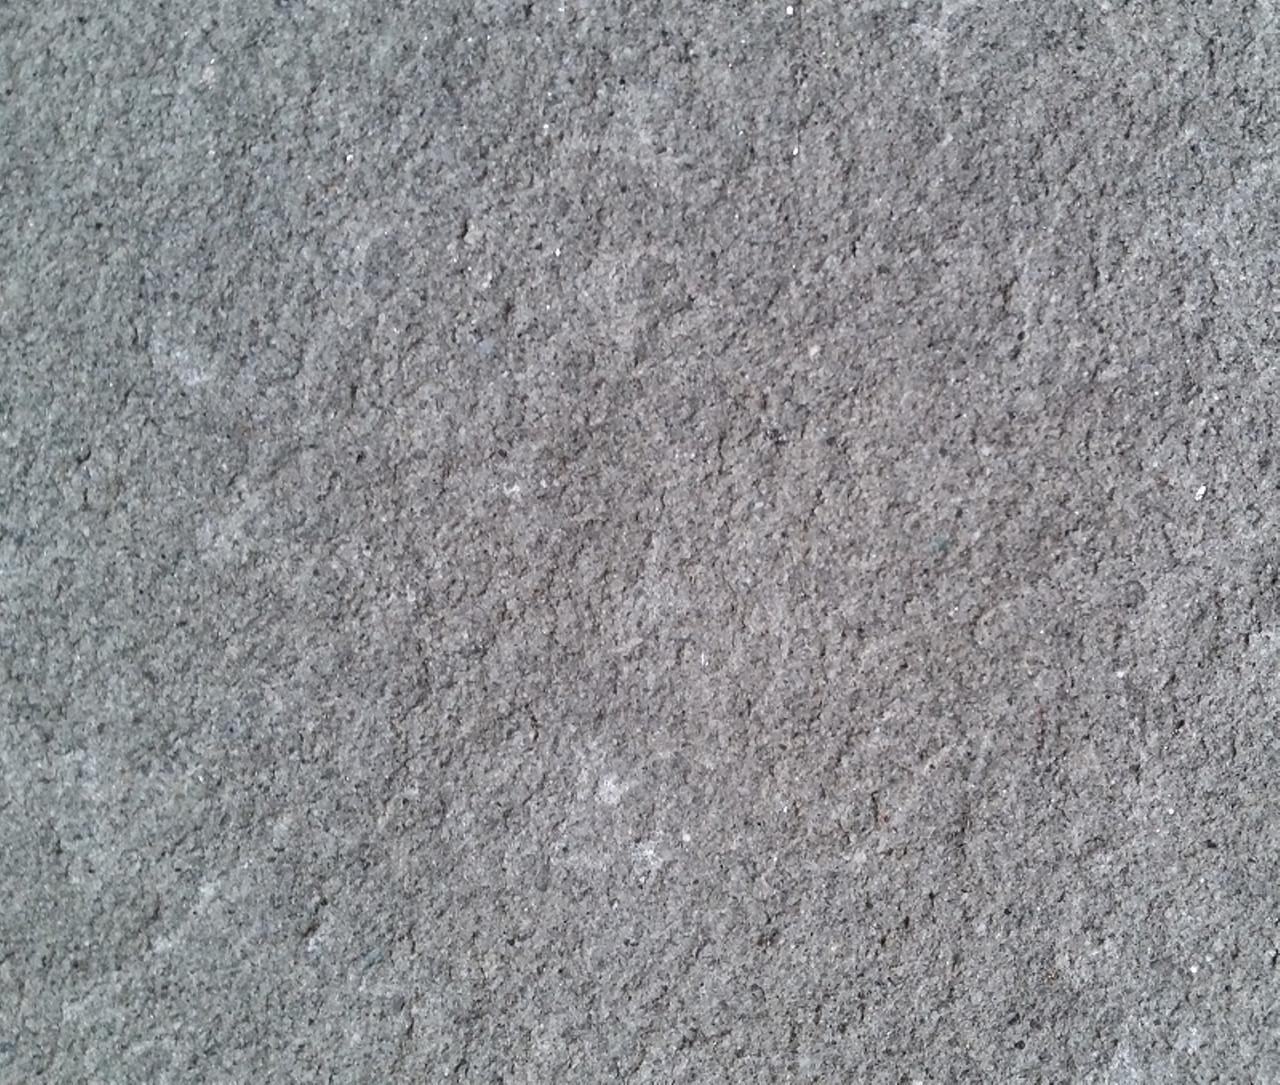 Bluestone Sample - Thermal (Flamed) / Honed